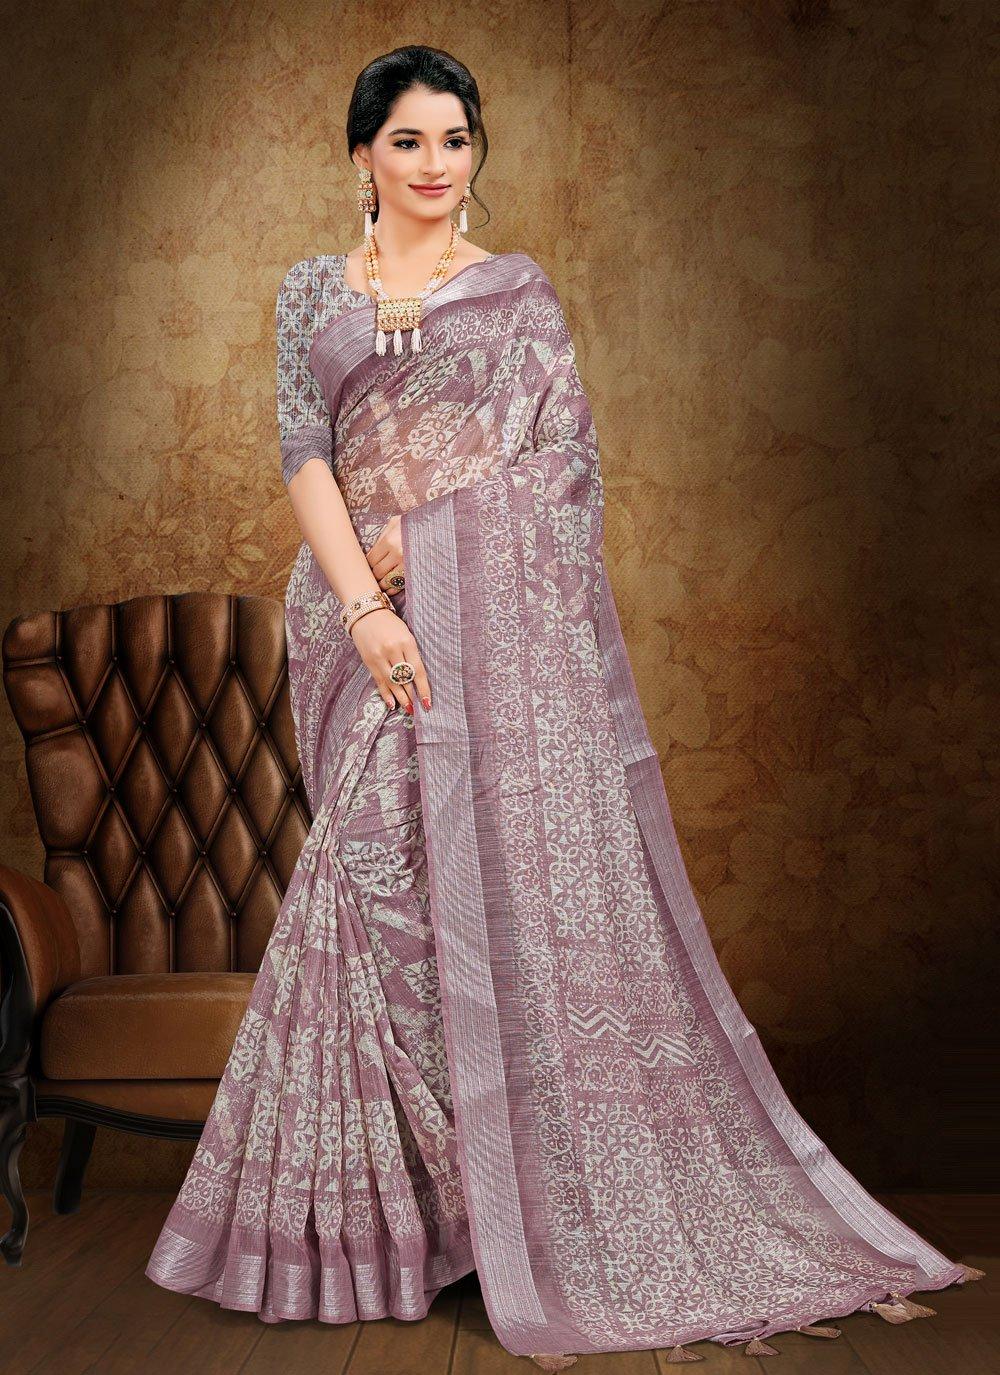 Abstract Print Cotton Printed Saree